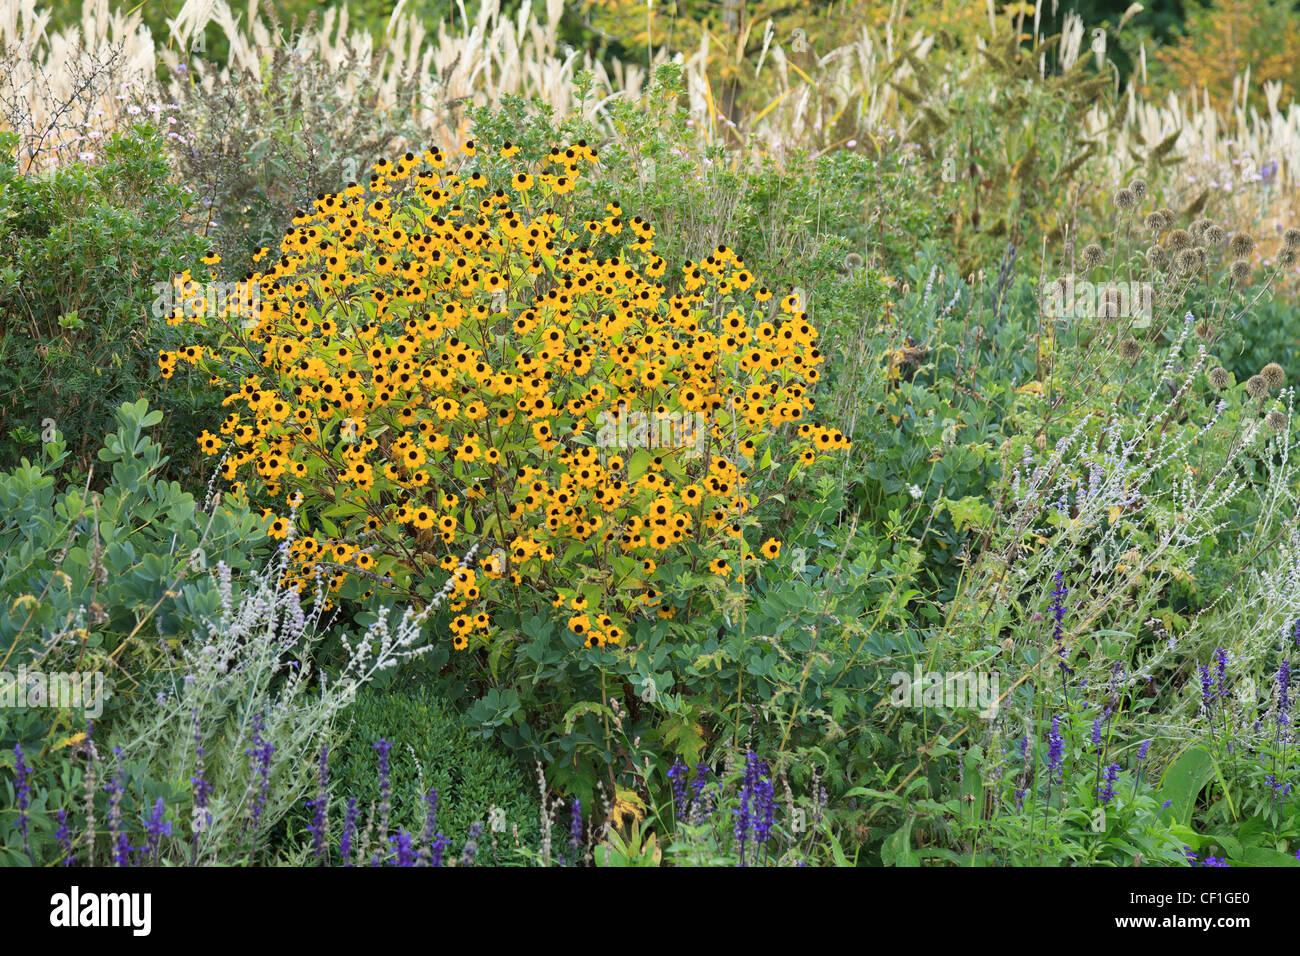 In fall, perennials, Rudbeckia, grasses ...(France, Chaumont-sur-Loire, Festival International des Jardins) - Stock Image